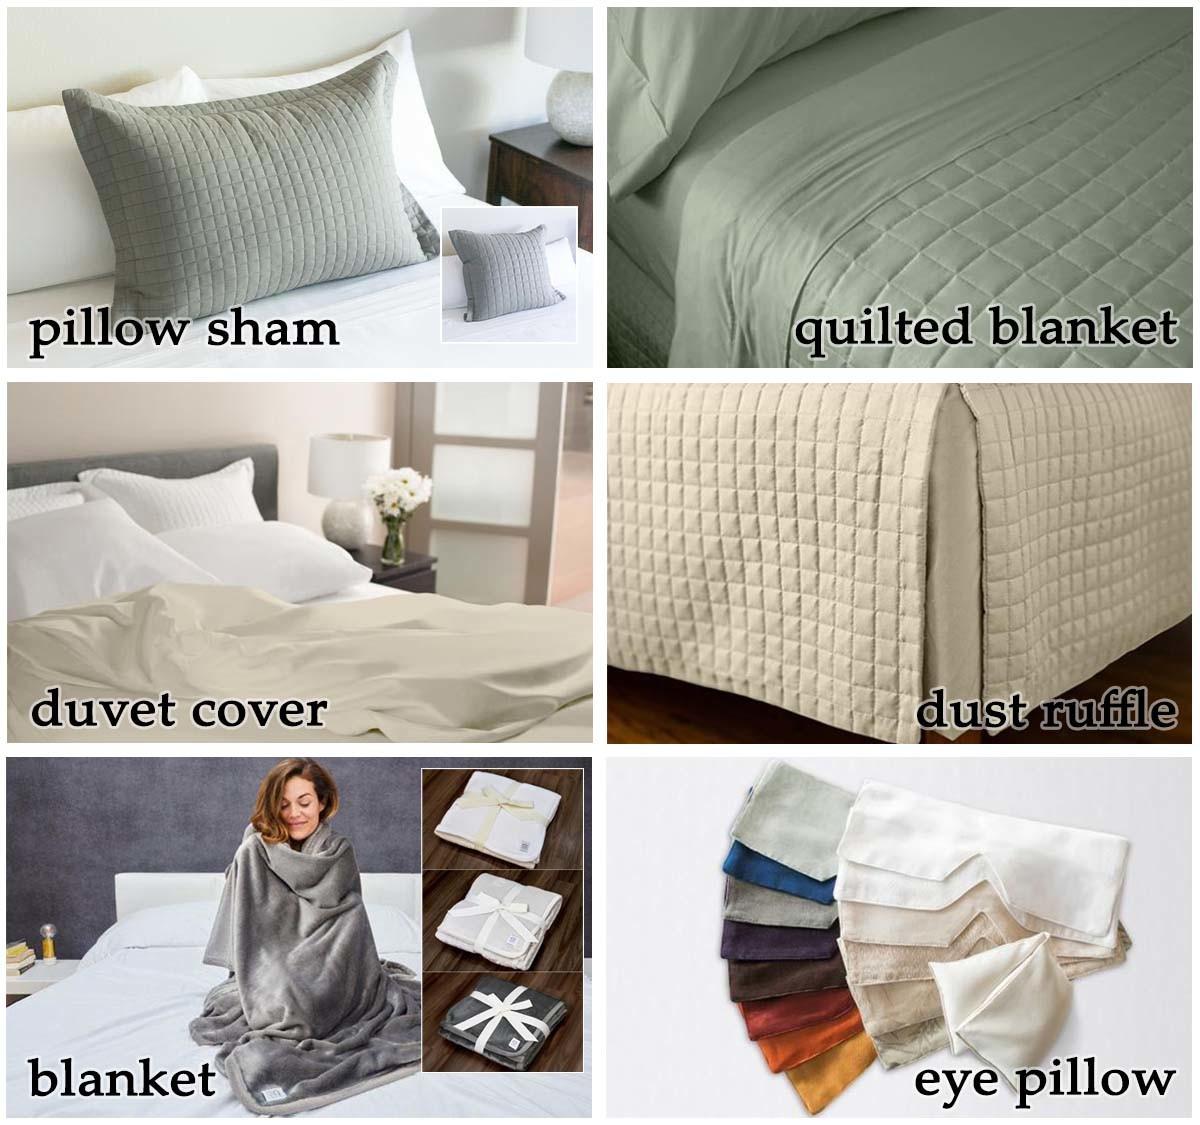 pillow sham, quilted blanket, duvet cover, dust ruffle, blanket, and eye pillow